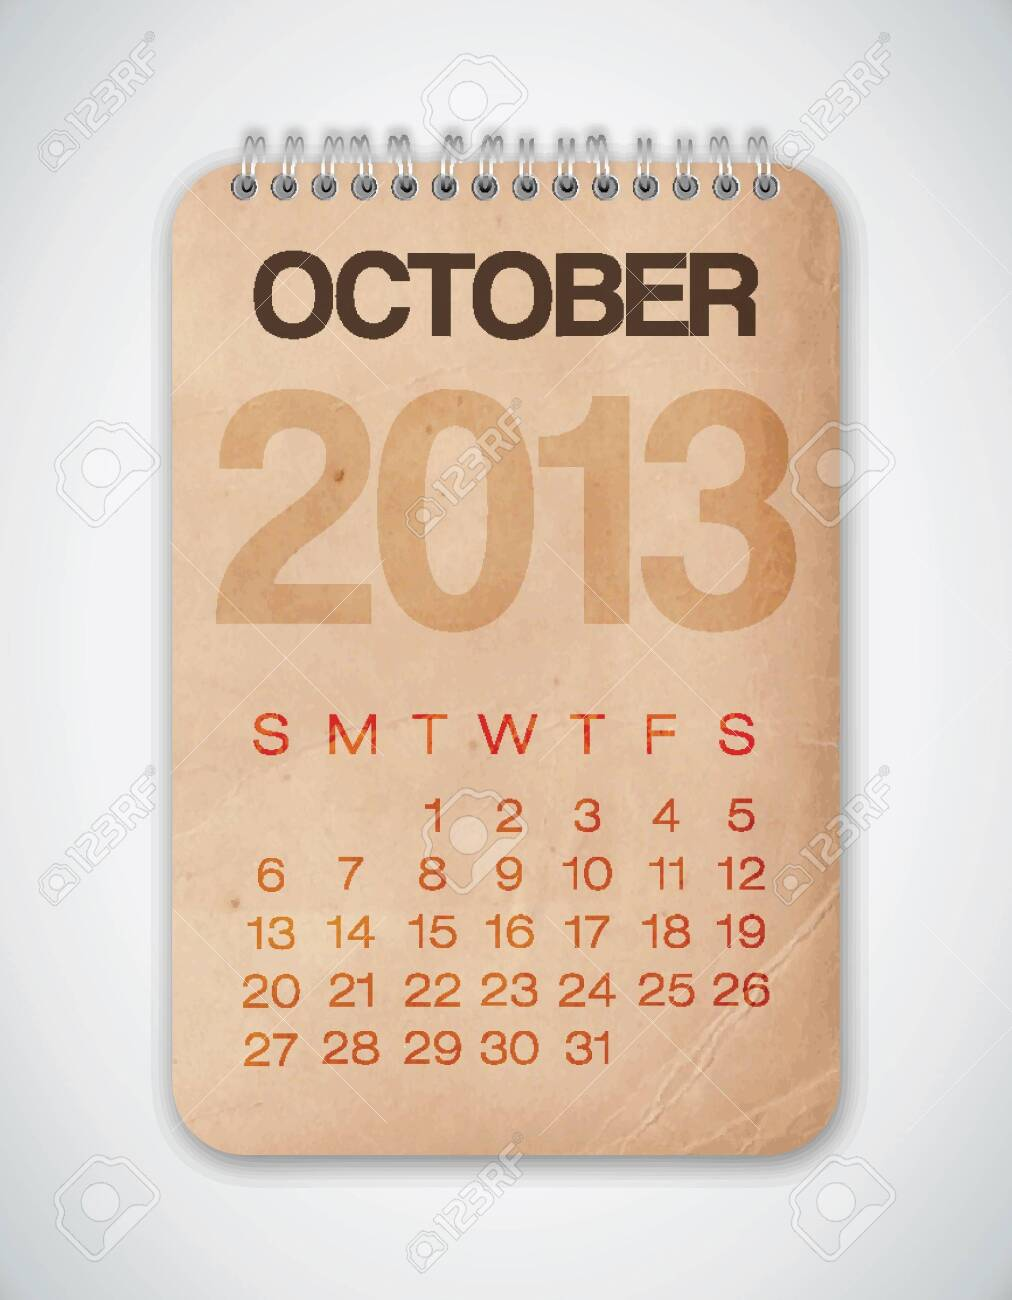 2013 Calendar October Grunge Texture Stock Vector - 15433107